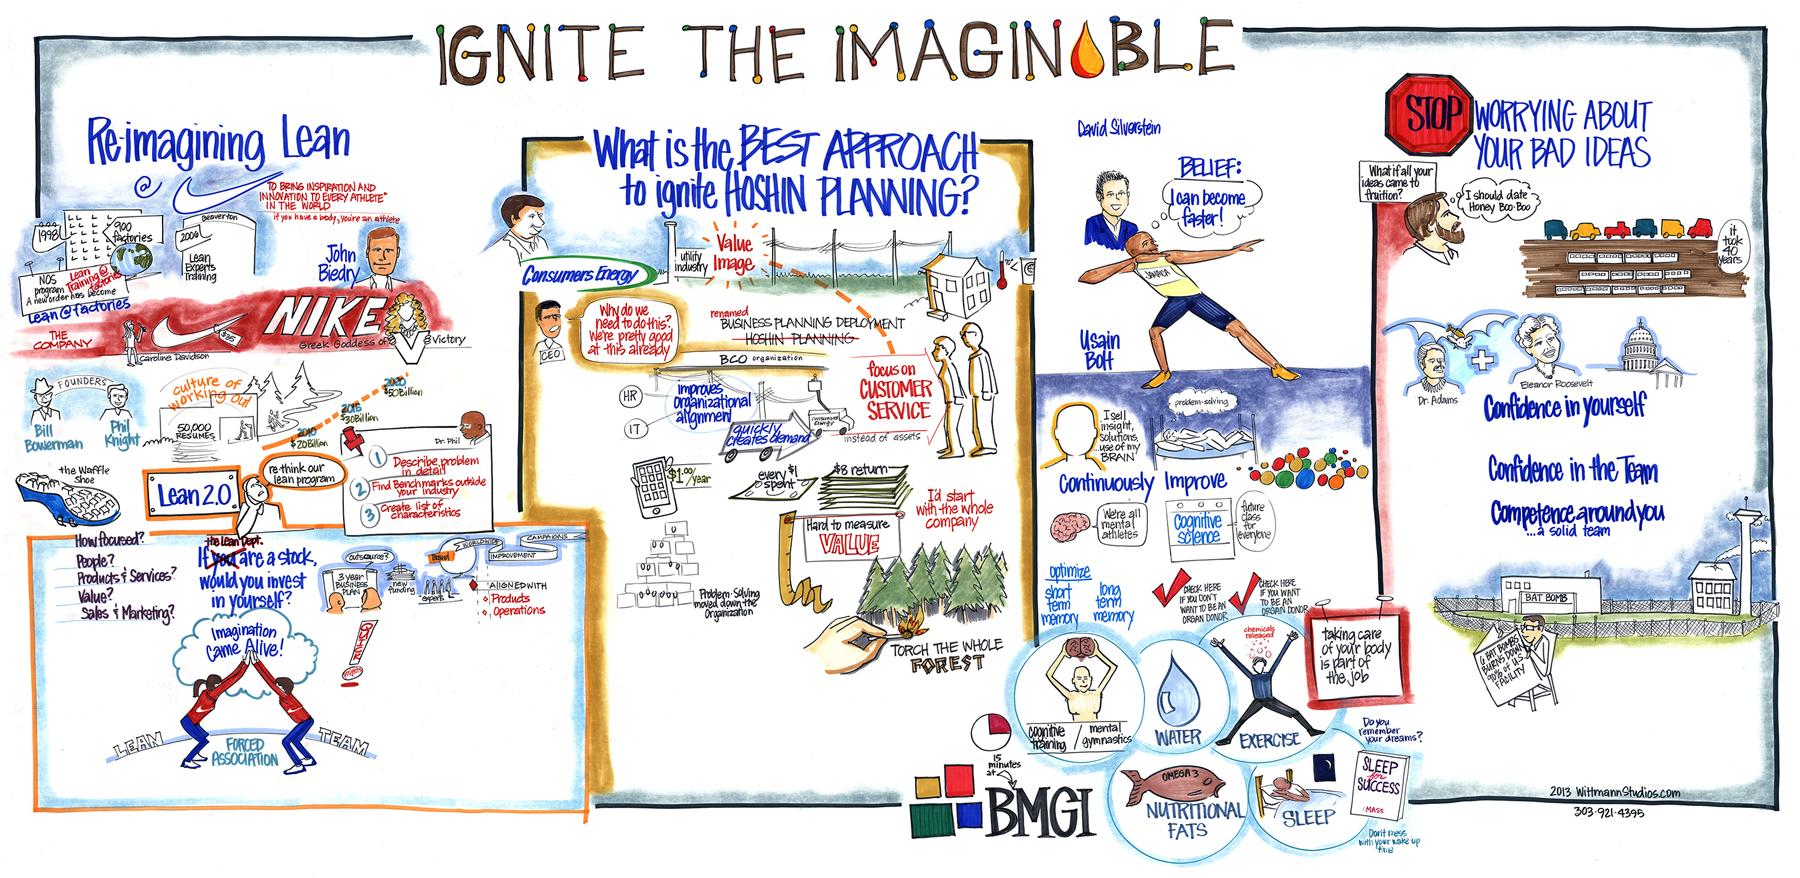 BMGI Summit -003 3m.jpg